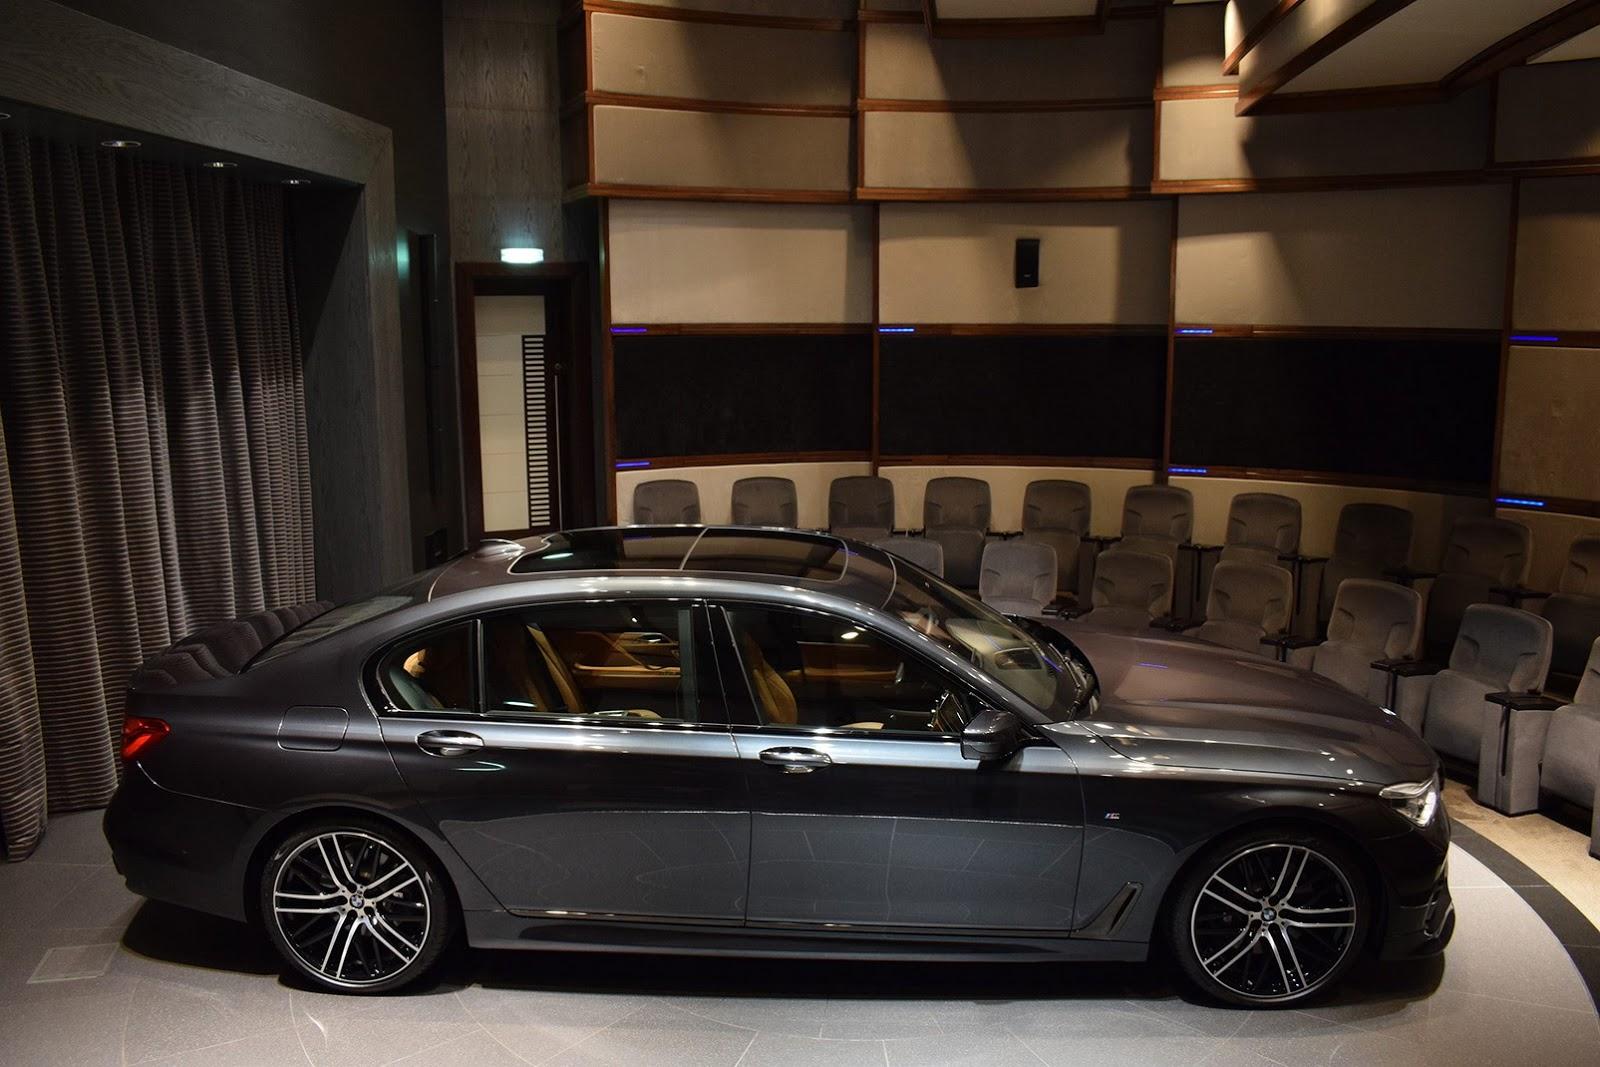 BMW Convertible 2004 bmw 750 Abu Dhabi BMW Adorns BMW 750Li With 3D Design and M Performance Parts